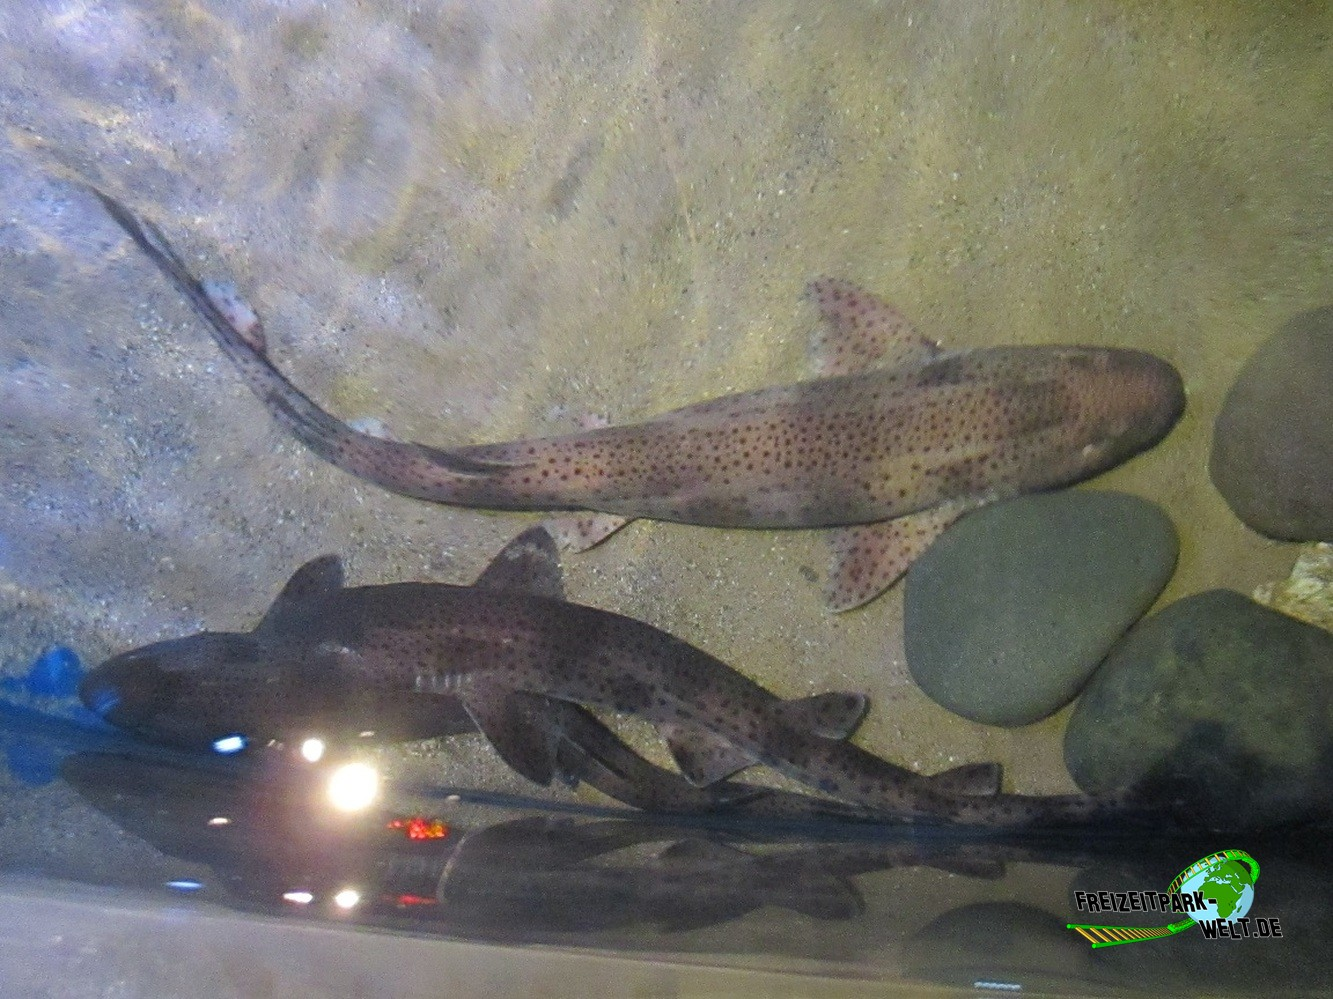 Sea Life Centre K?nigswinter : Weitere Foto-Shows aus dem SEA LIFE K?nigswinter